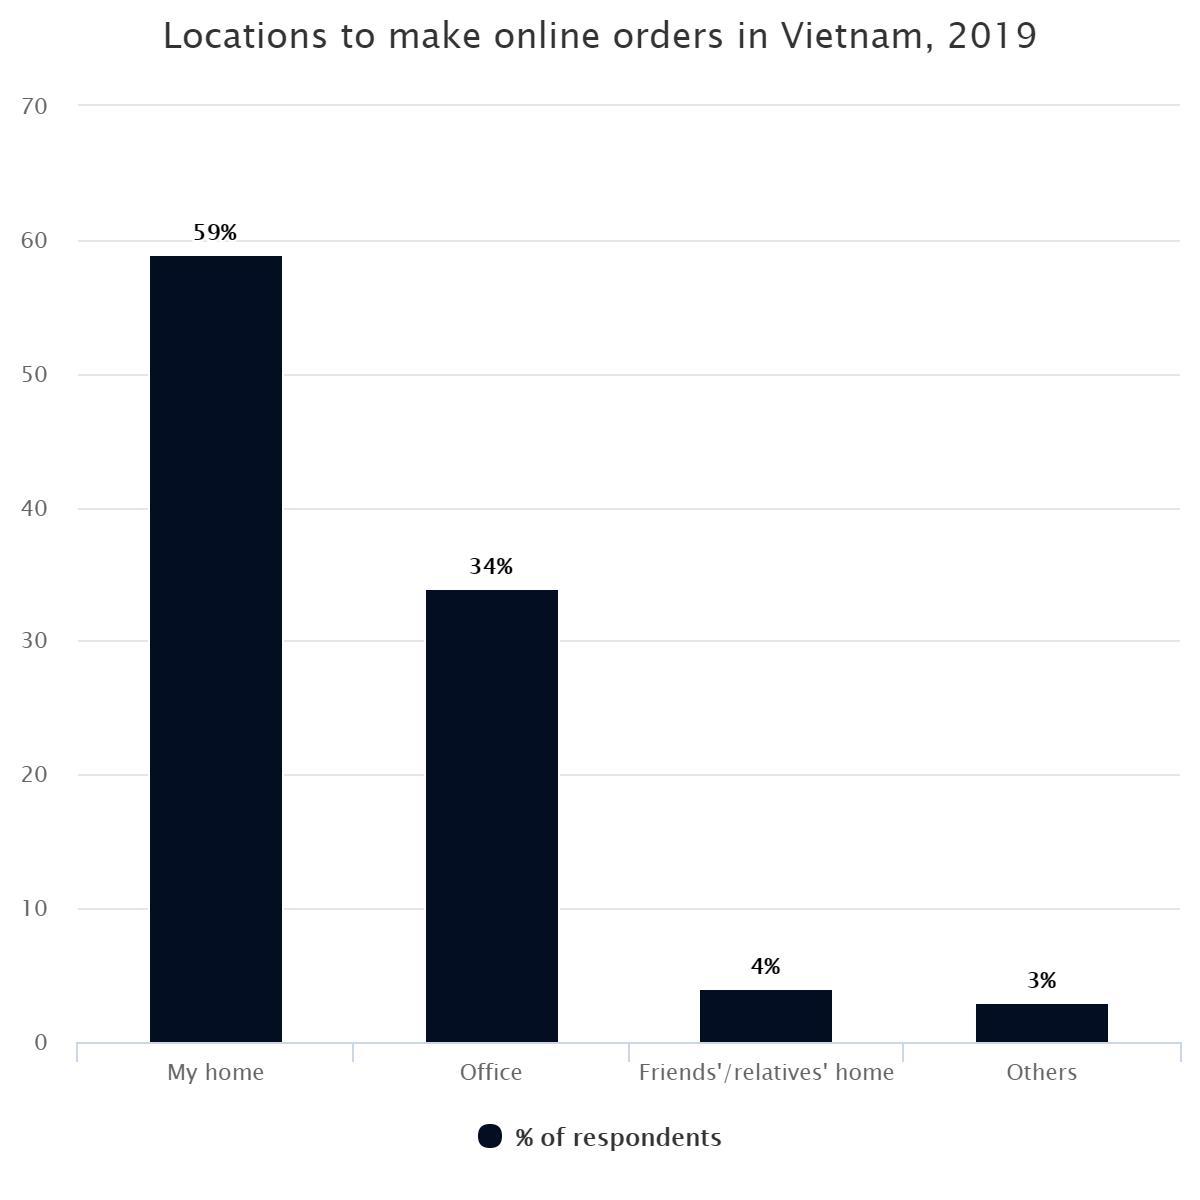 Locations to make online orders in Vietnam, 2019